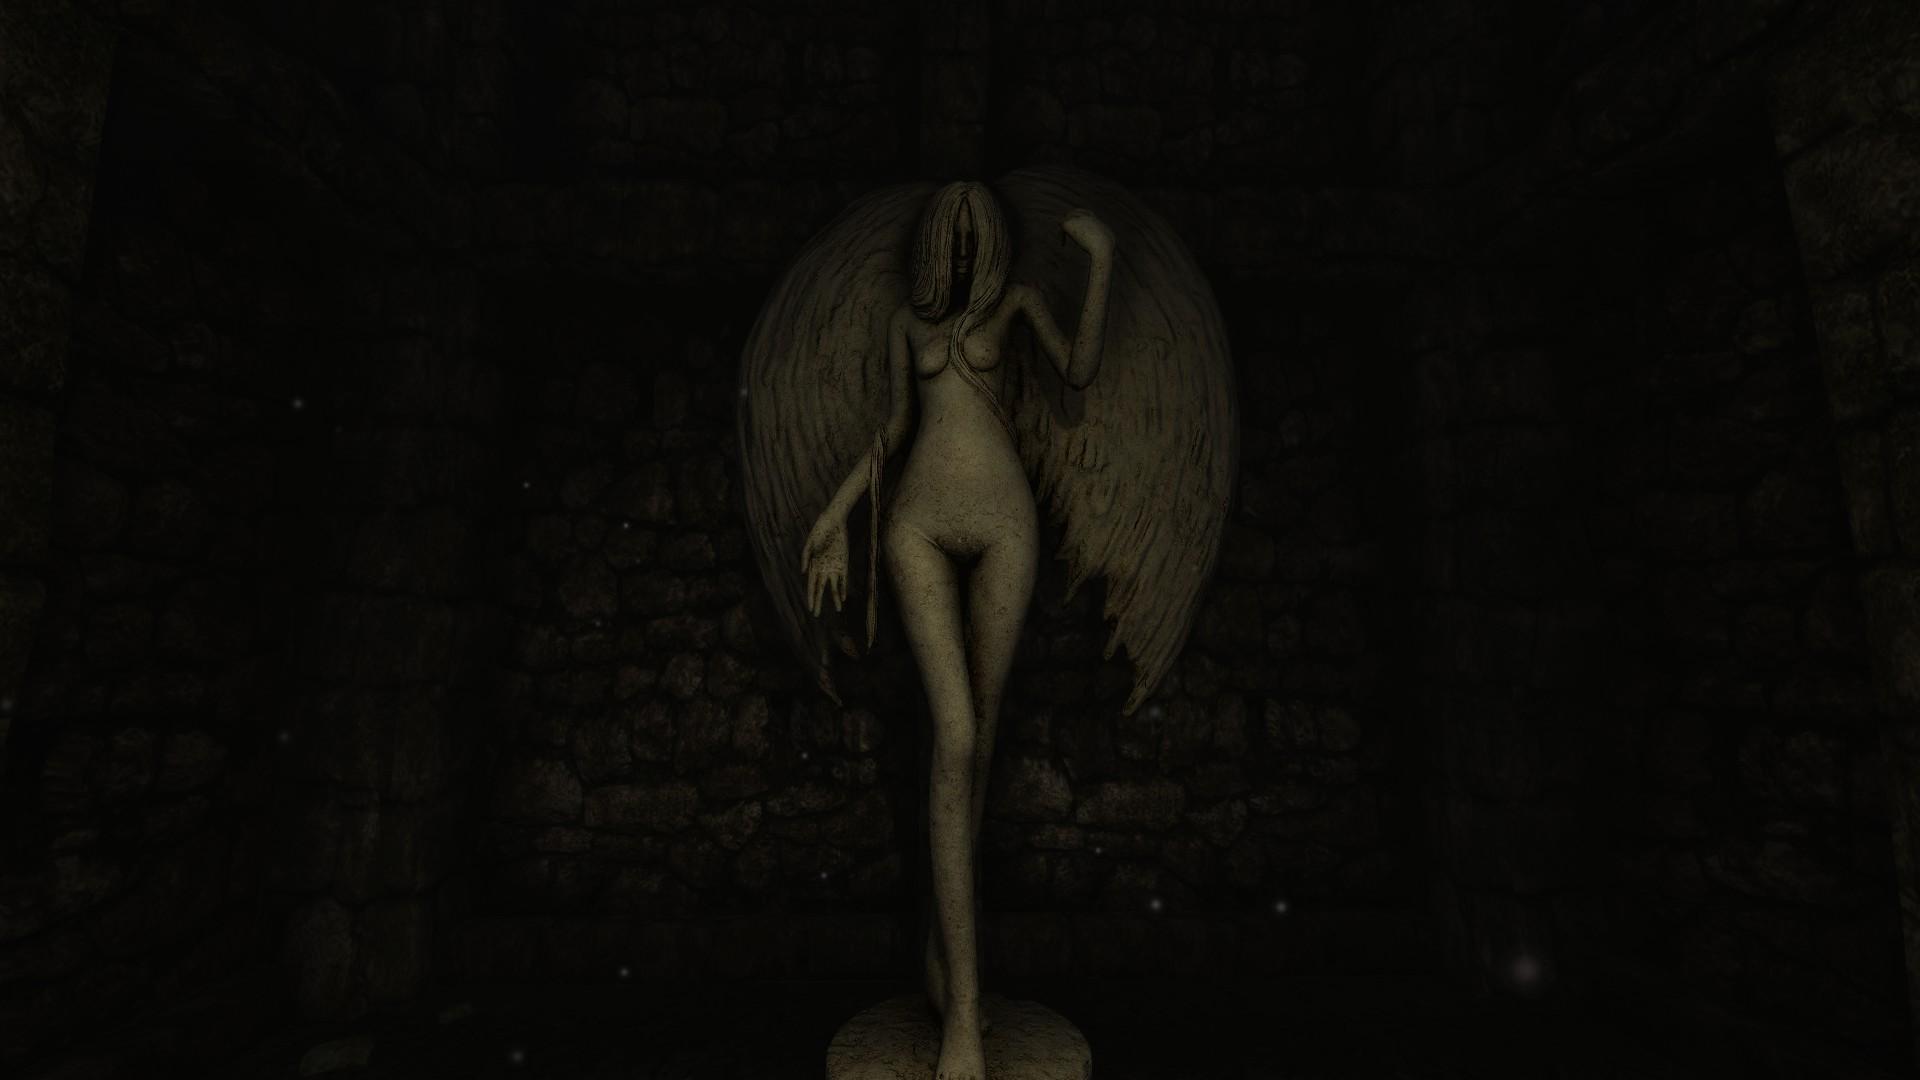 20180216211145_1.jpg - Amnesia: The Dark Descent